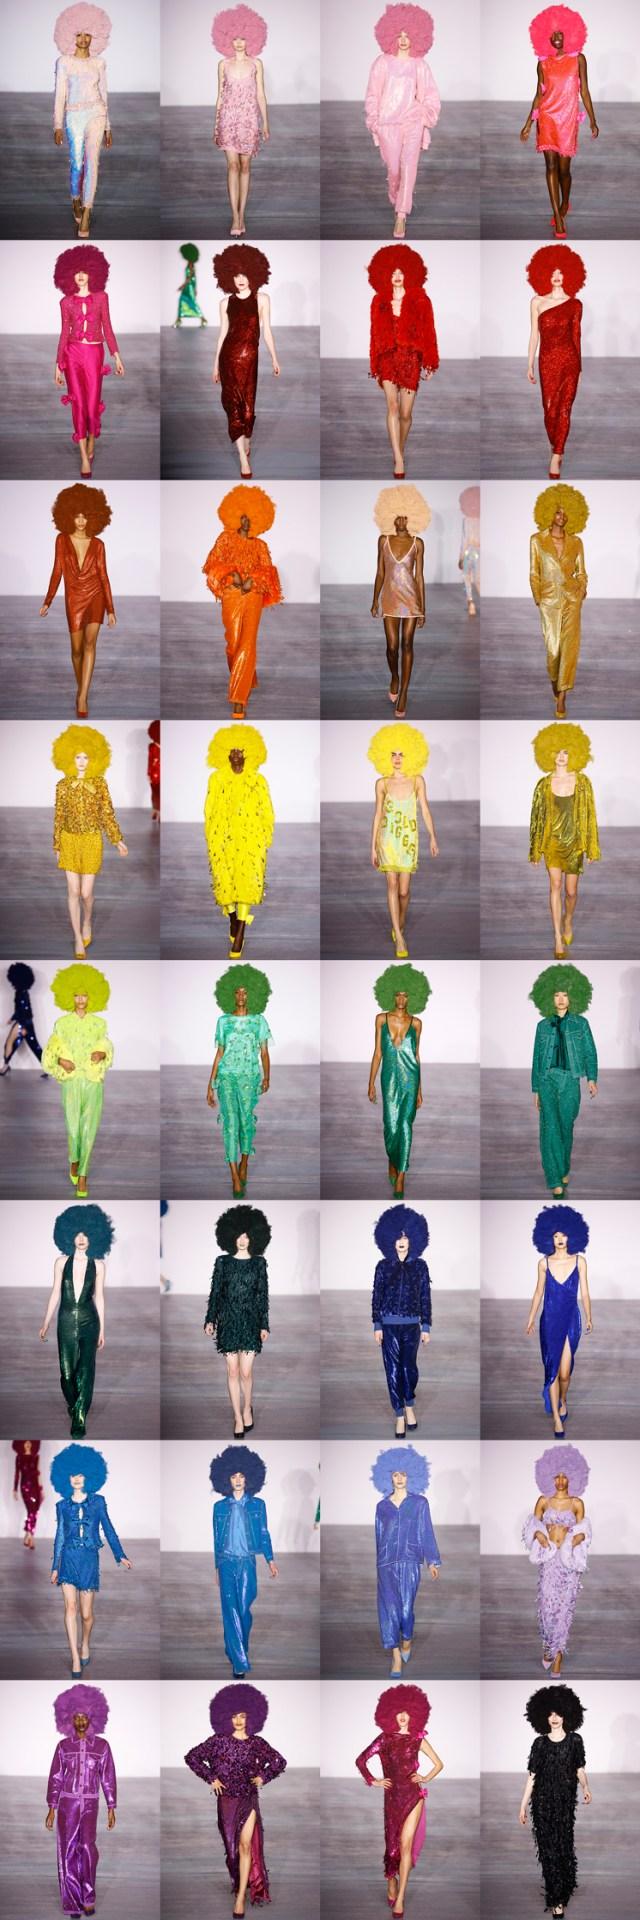 Rainbow fros by Ashish Fall 2016 ready to wear